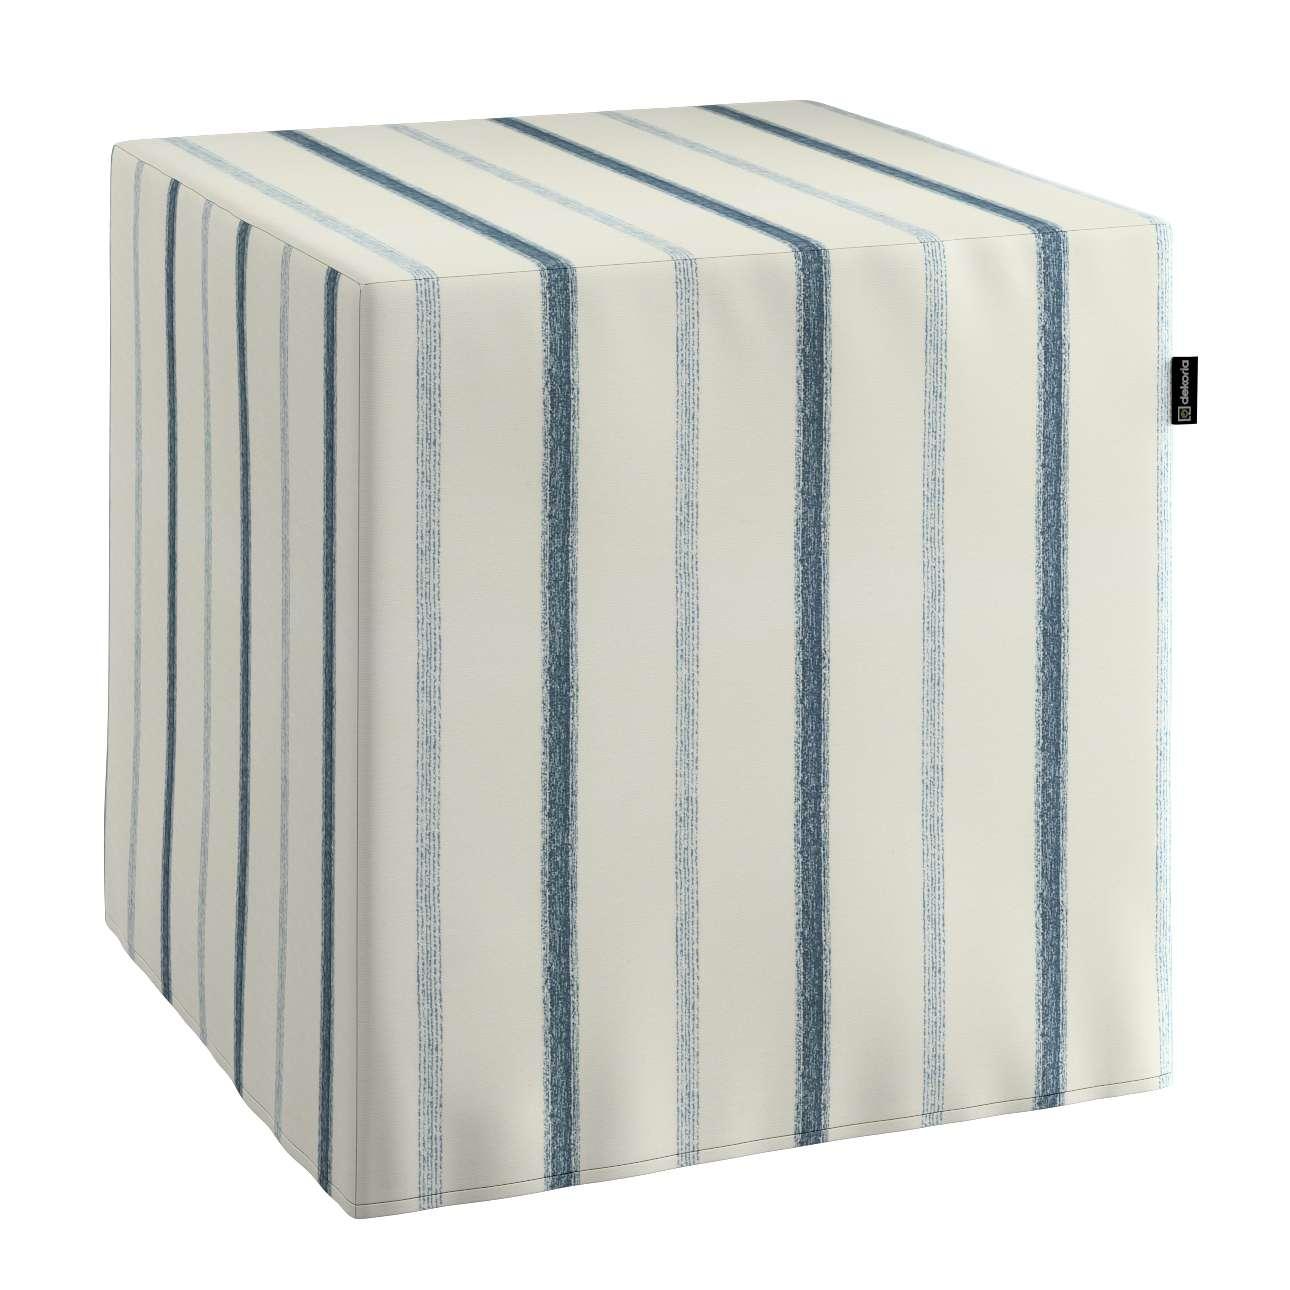 Sedák Cube - kostka pevná 40x40x40 v kolekci Avignon, látka: 129-66